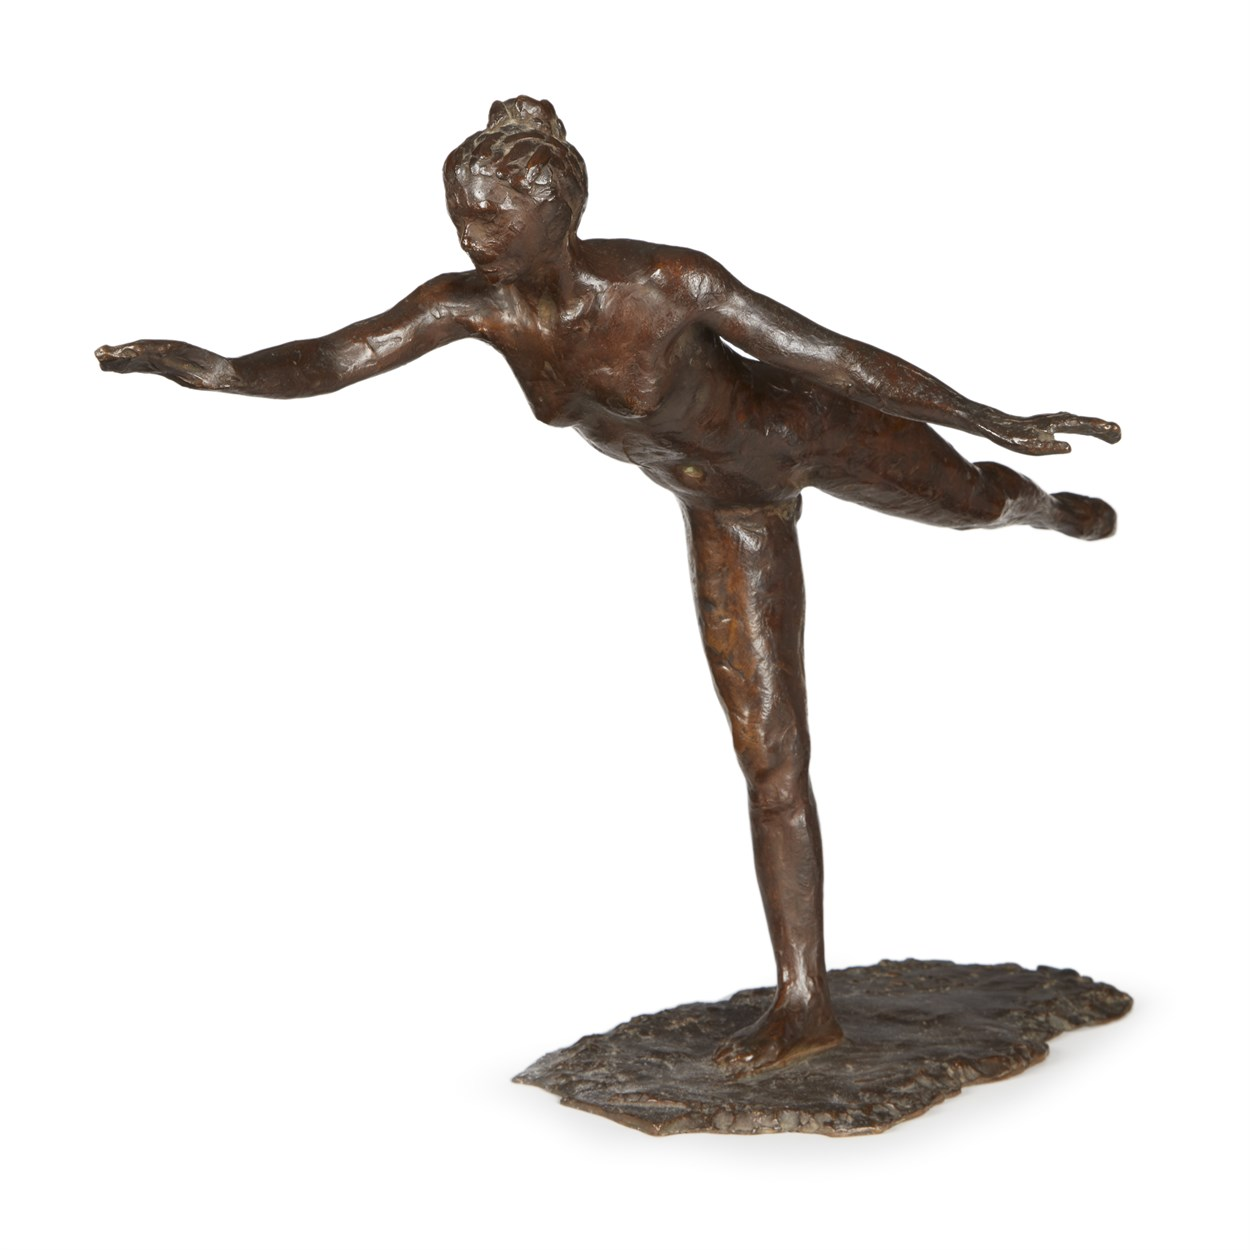 Lot 48 - Edgar Degas (French, 1834-1917)